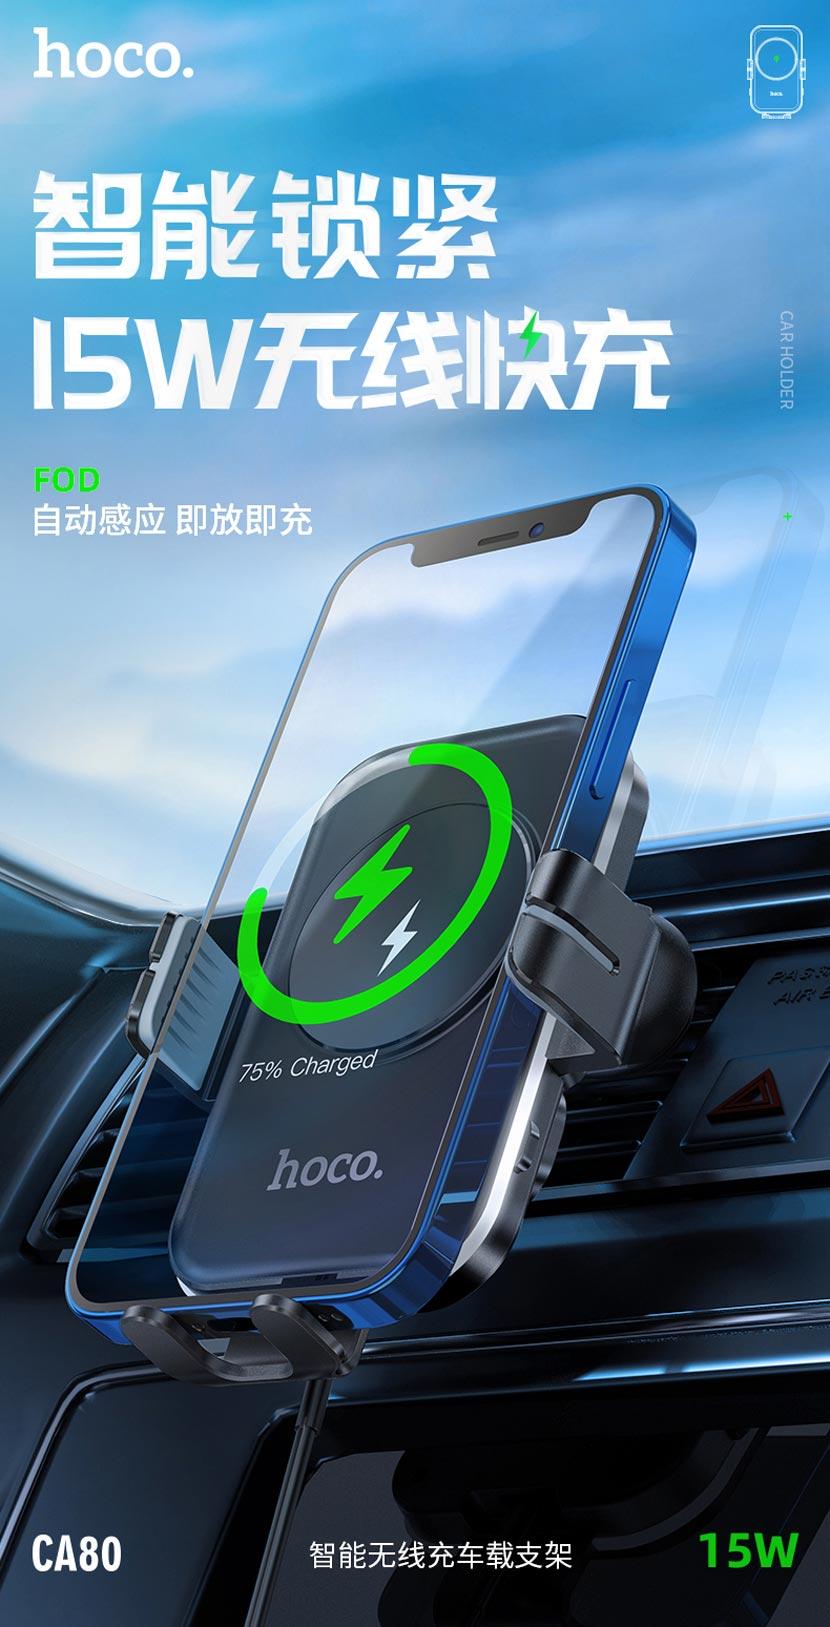 hoco news ca80 buddy smart wireless charging car holder cn